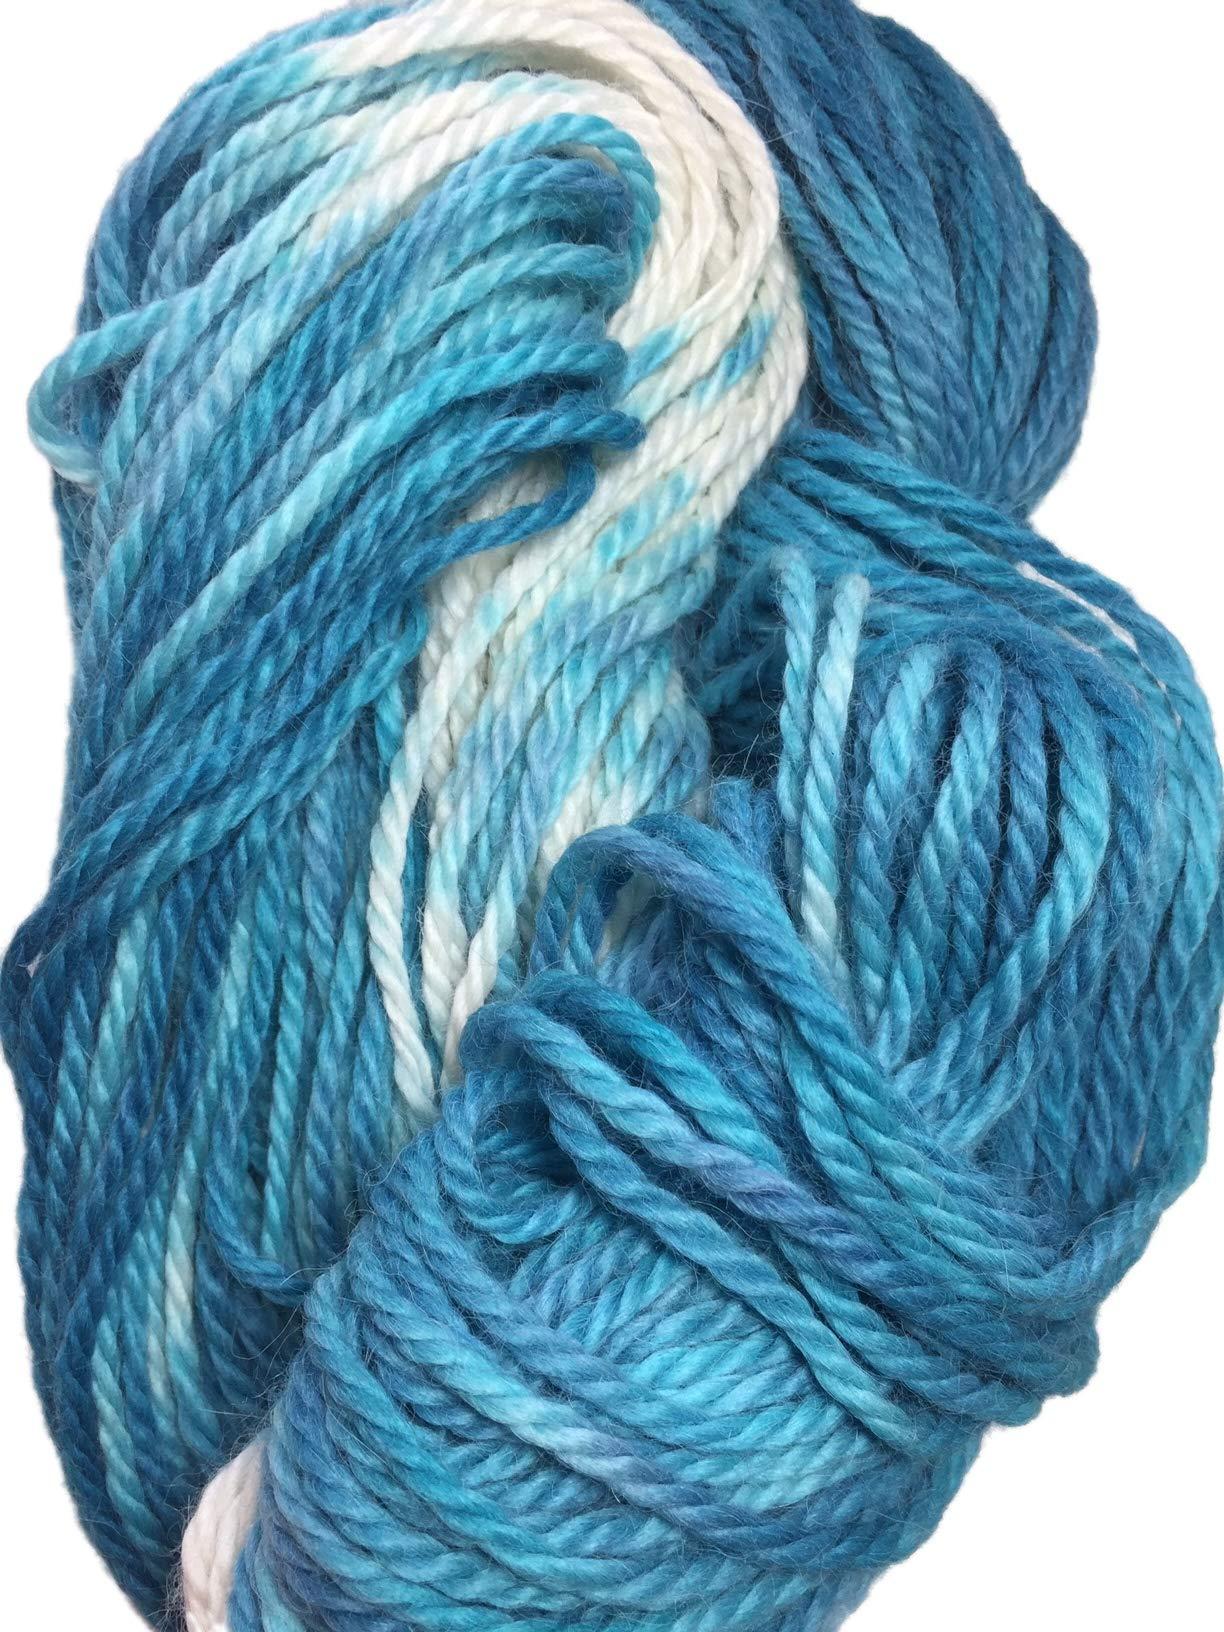 Hand Painted 100/% Alpaca Yarn